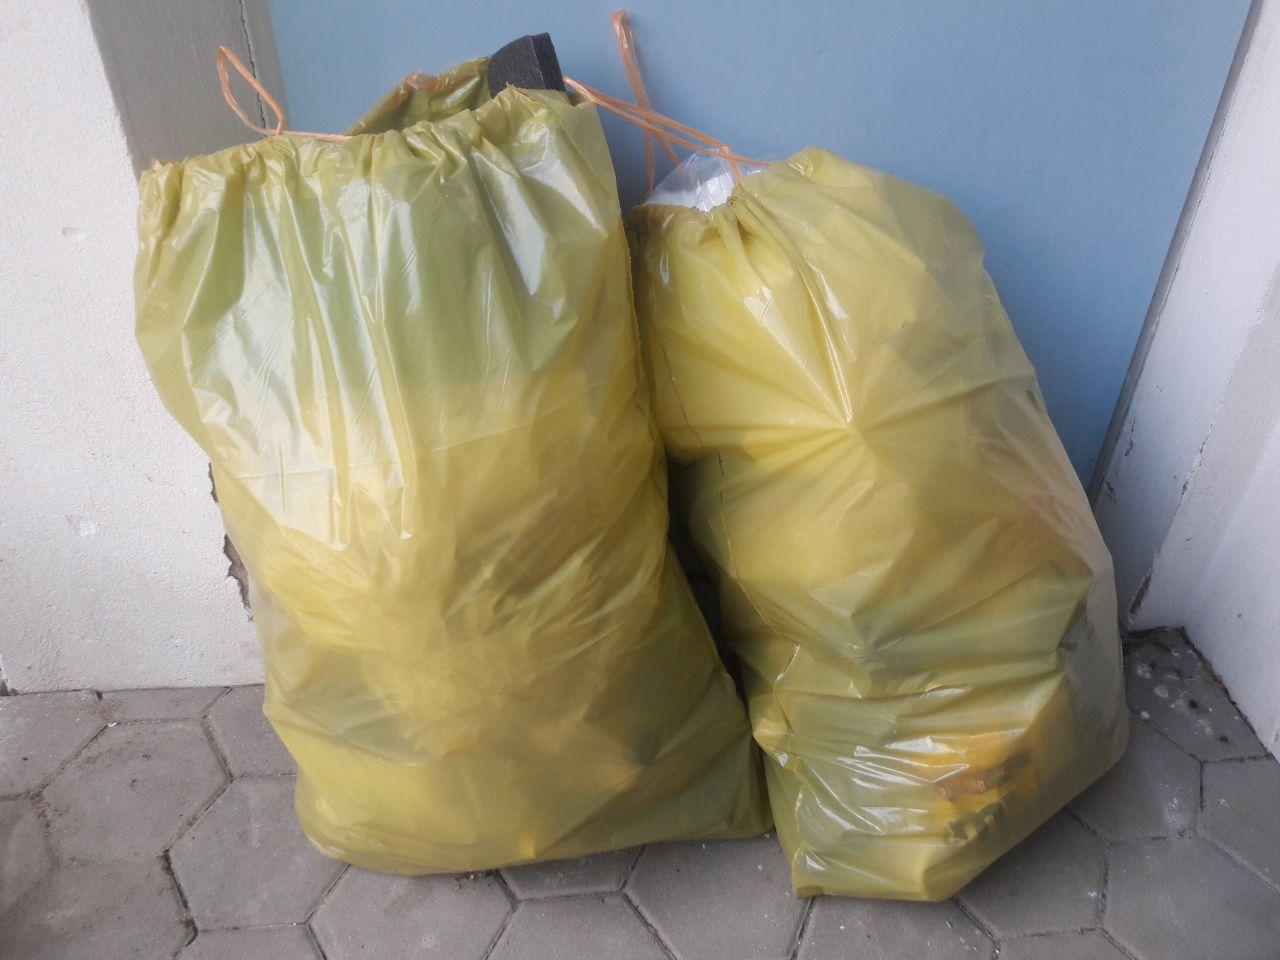 Why go plastic-free